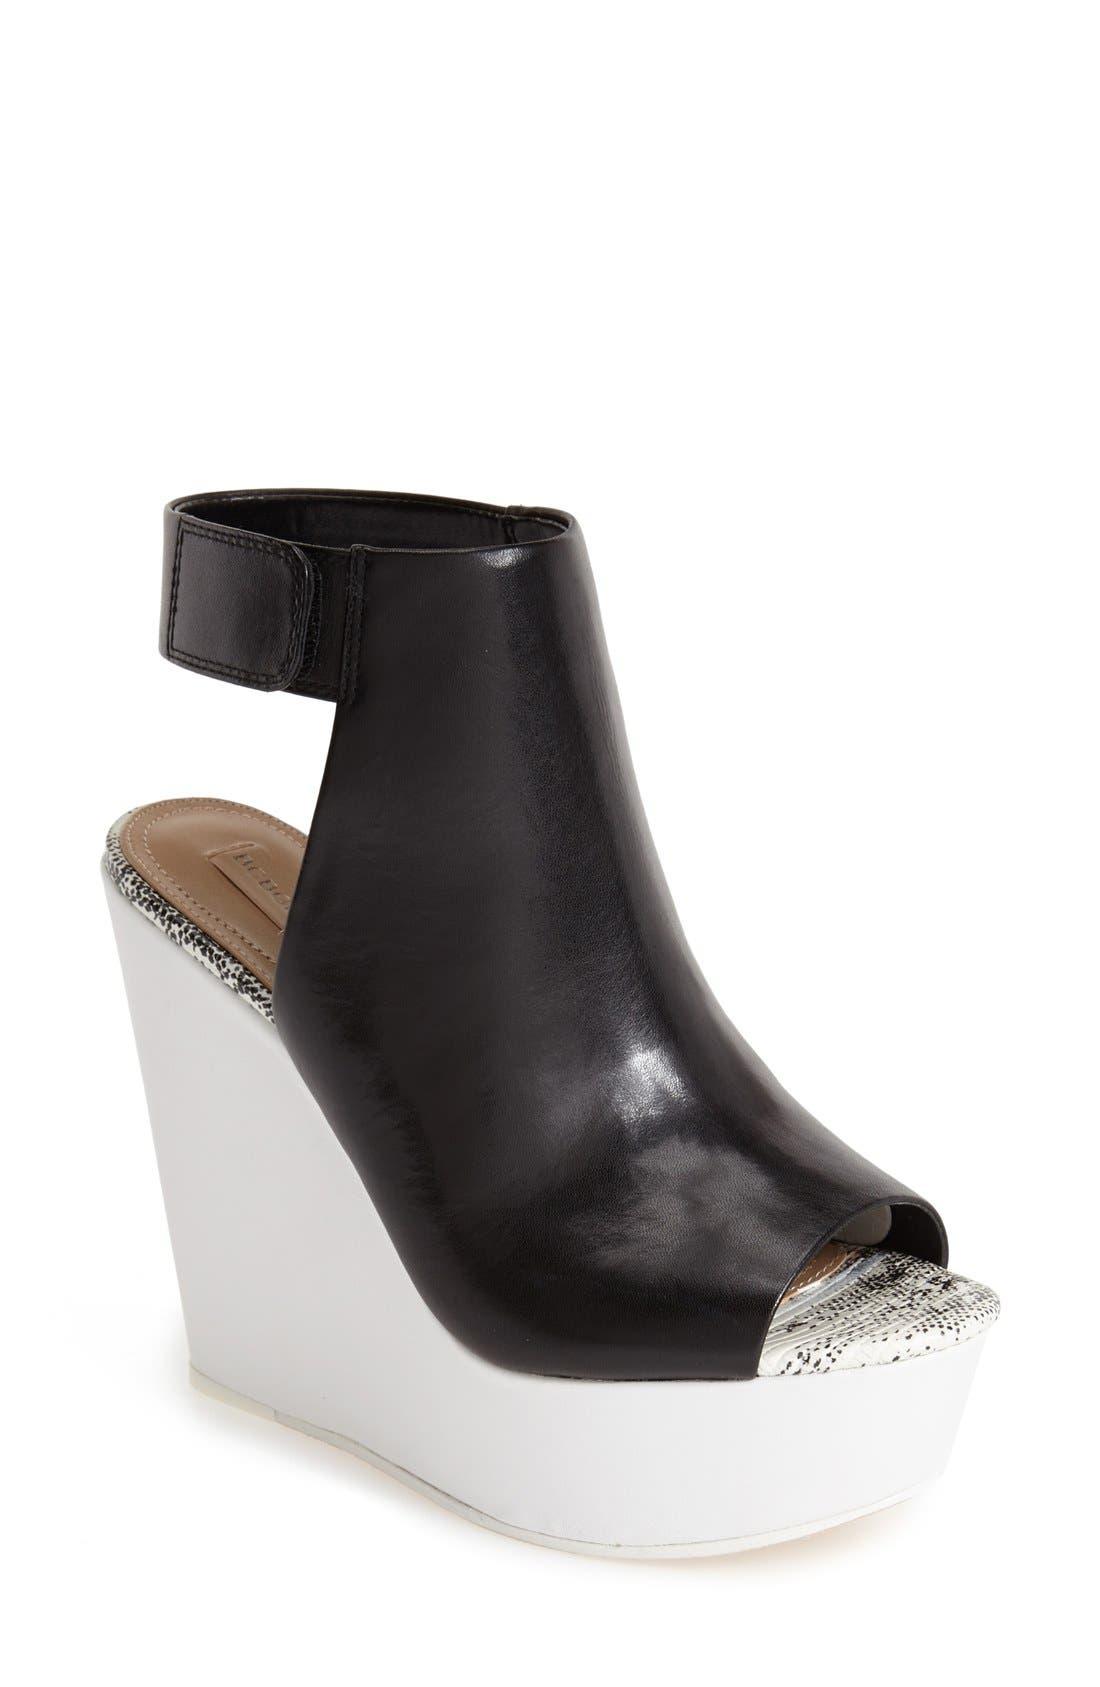 Main Image - BCBGMAXAZRIA 'Ma-Cue' Peep Toe Leather Wedge Sandal (Women)